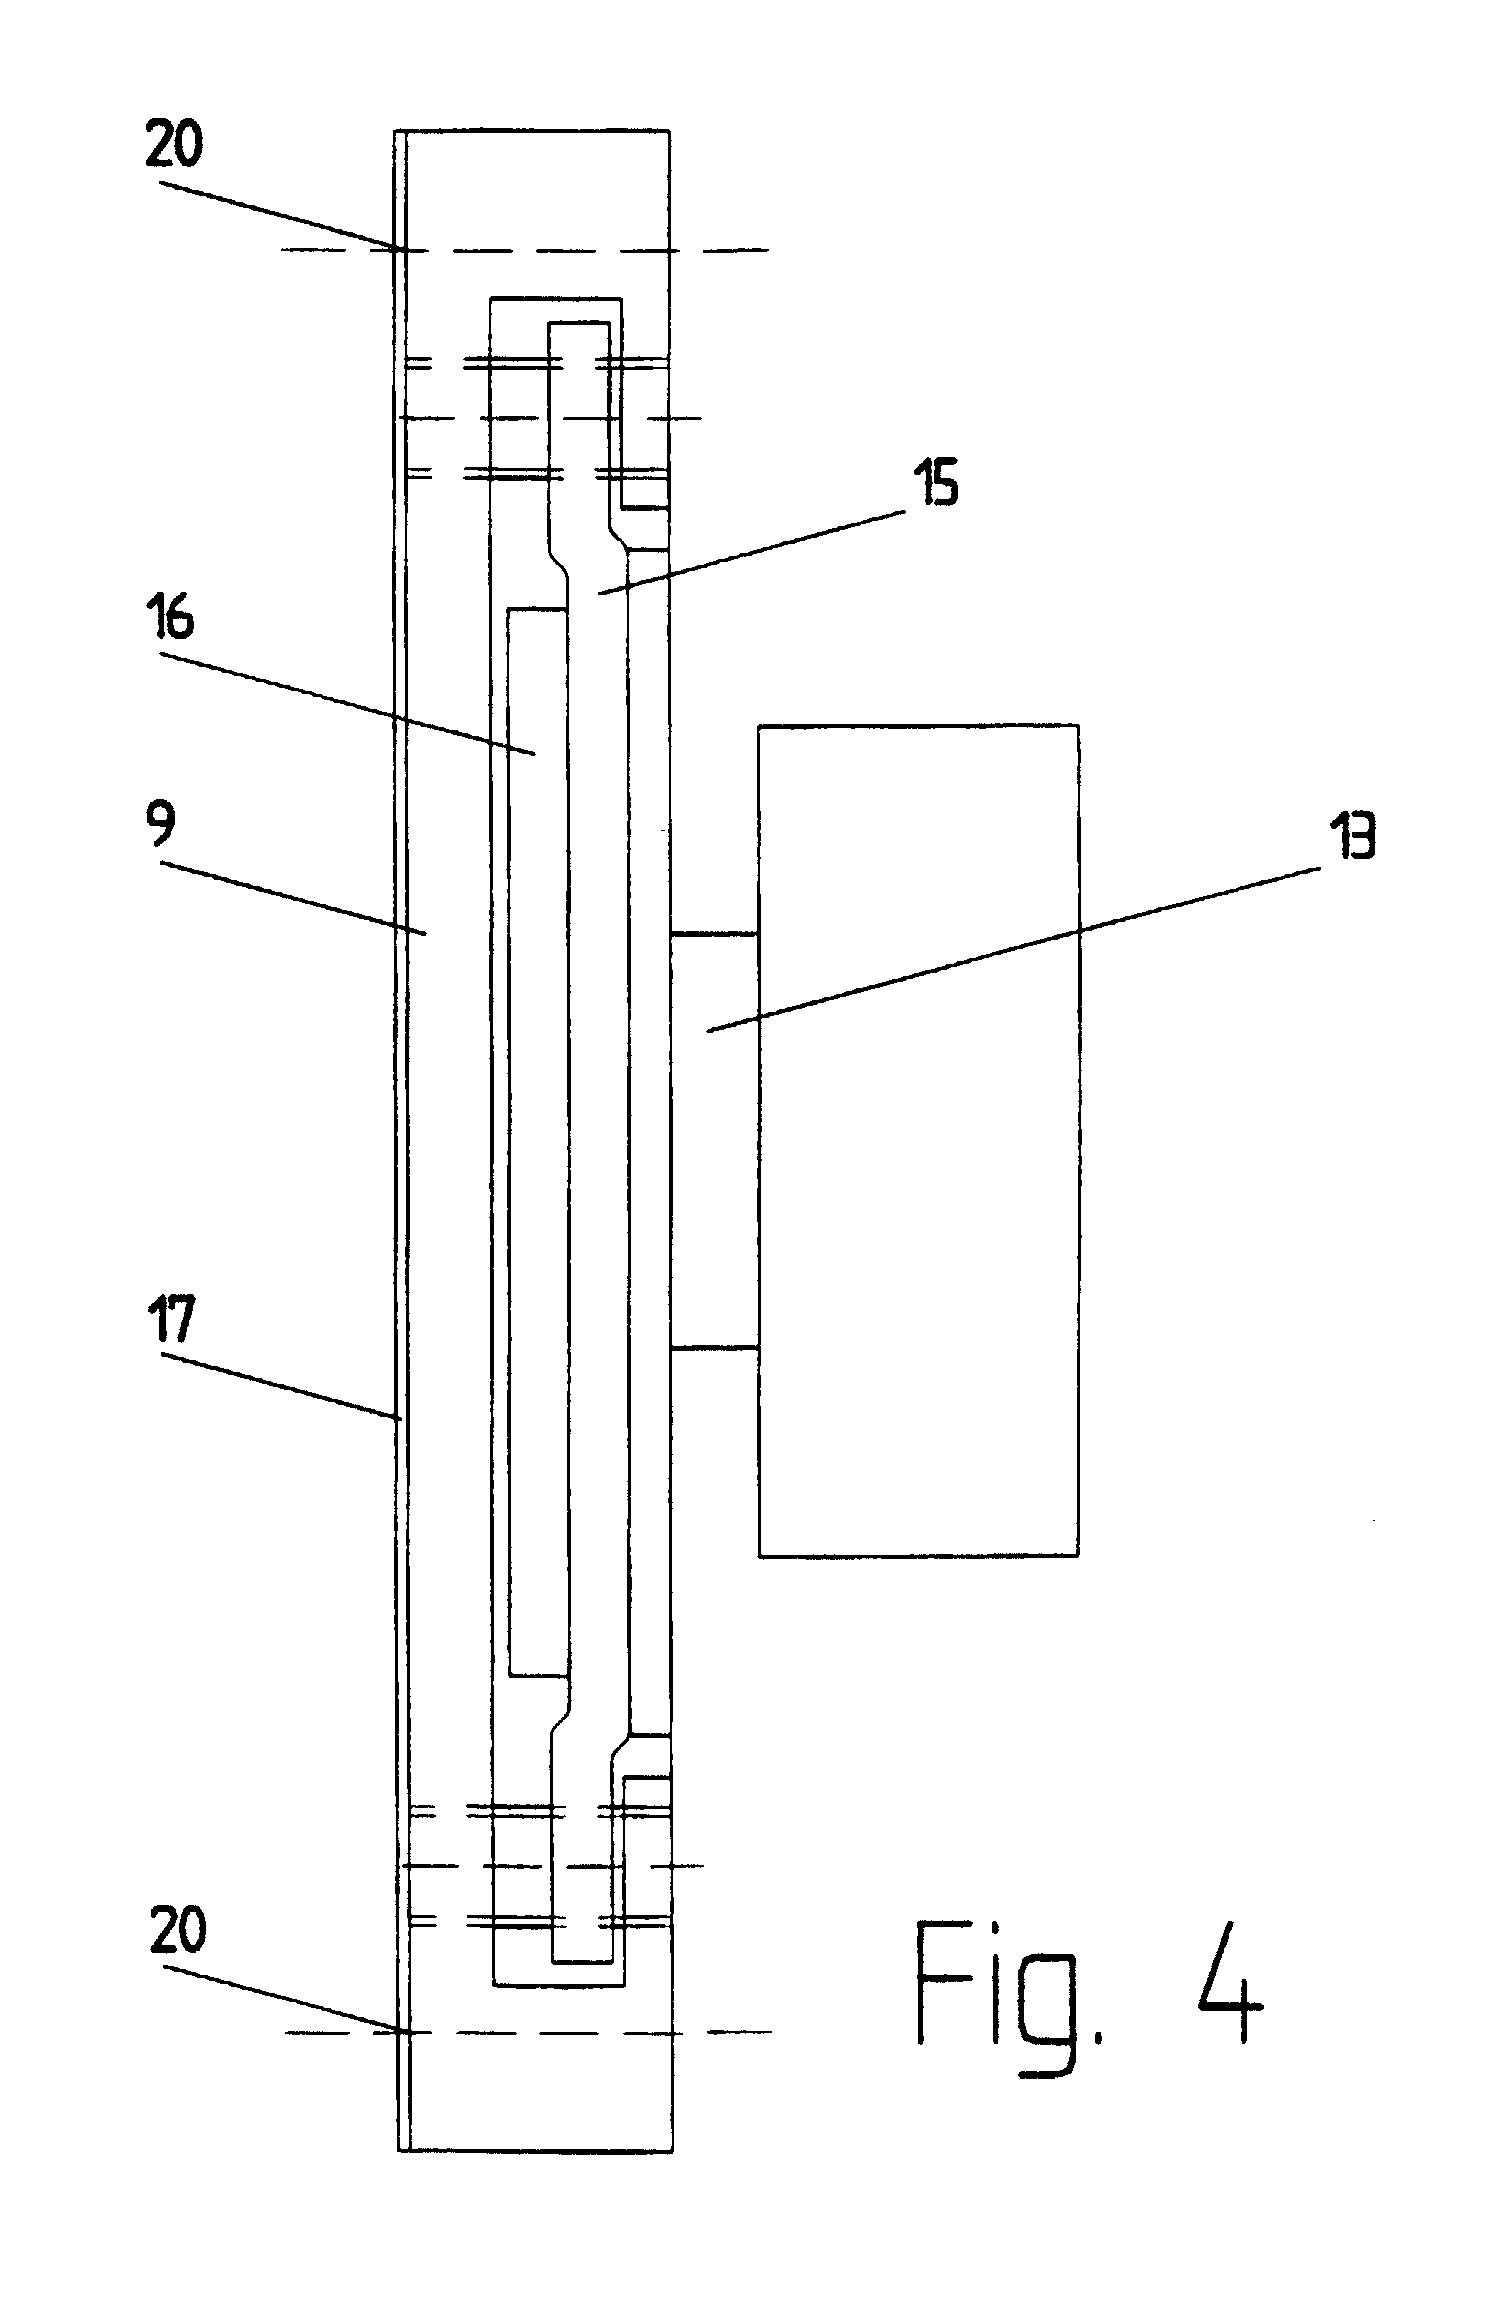 patent ep0922152b1 rahmenlose glast r mit rahmenlosem seitenteil google patents. Black Bedroom Furniture Sets. Home Design Ideas